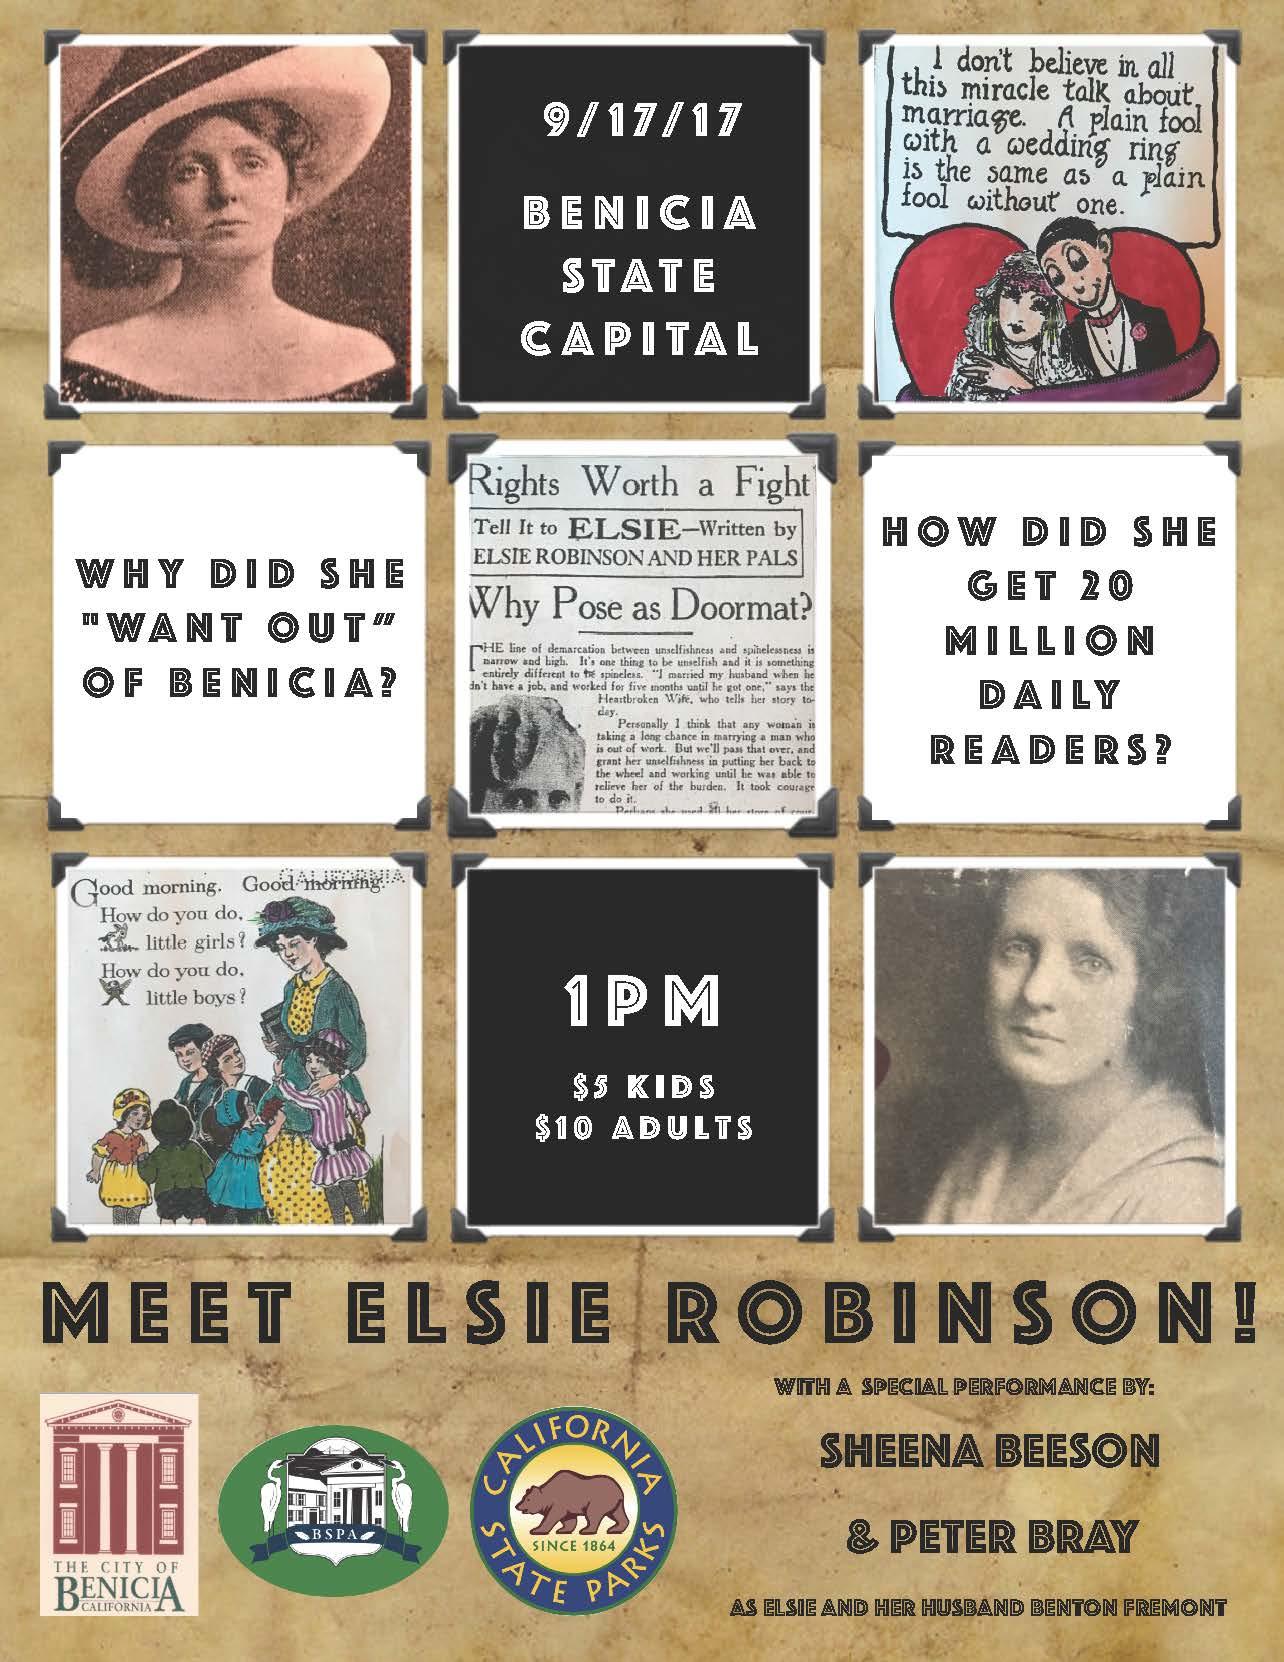 Elsie Robinson v8 final